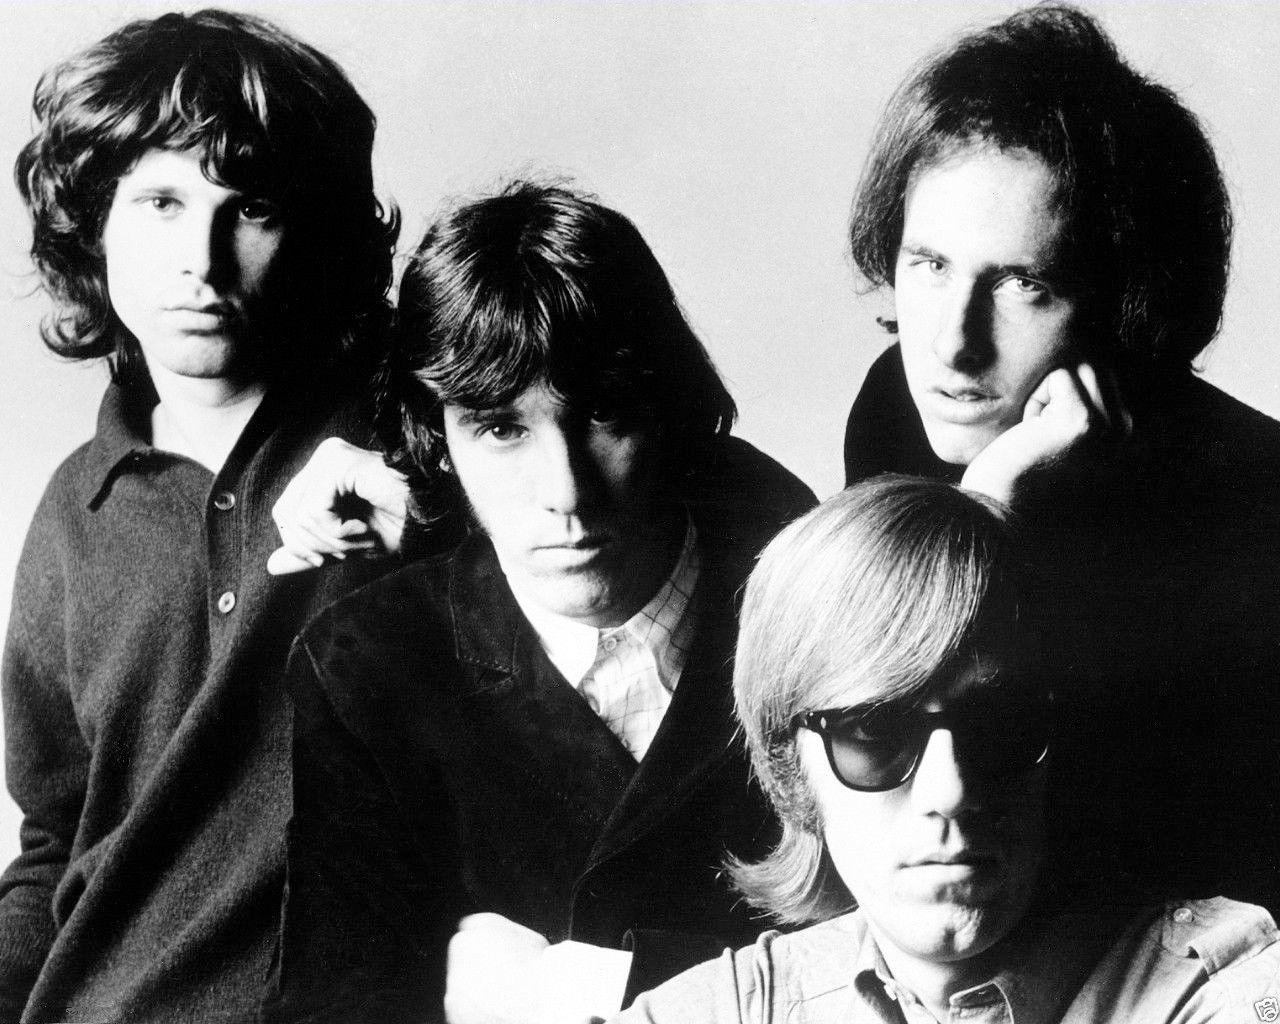 ¿Por qué razón The Doors nunca volvería a tocar en The Ed Sullivan Show?